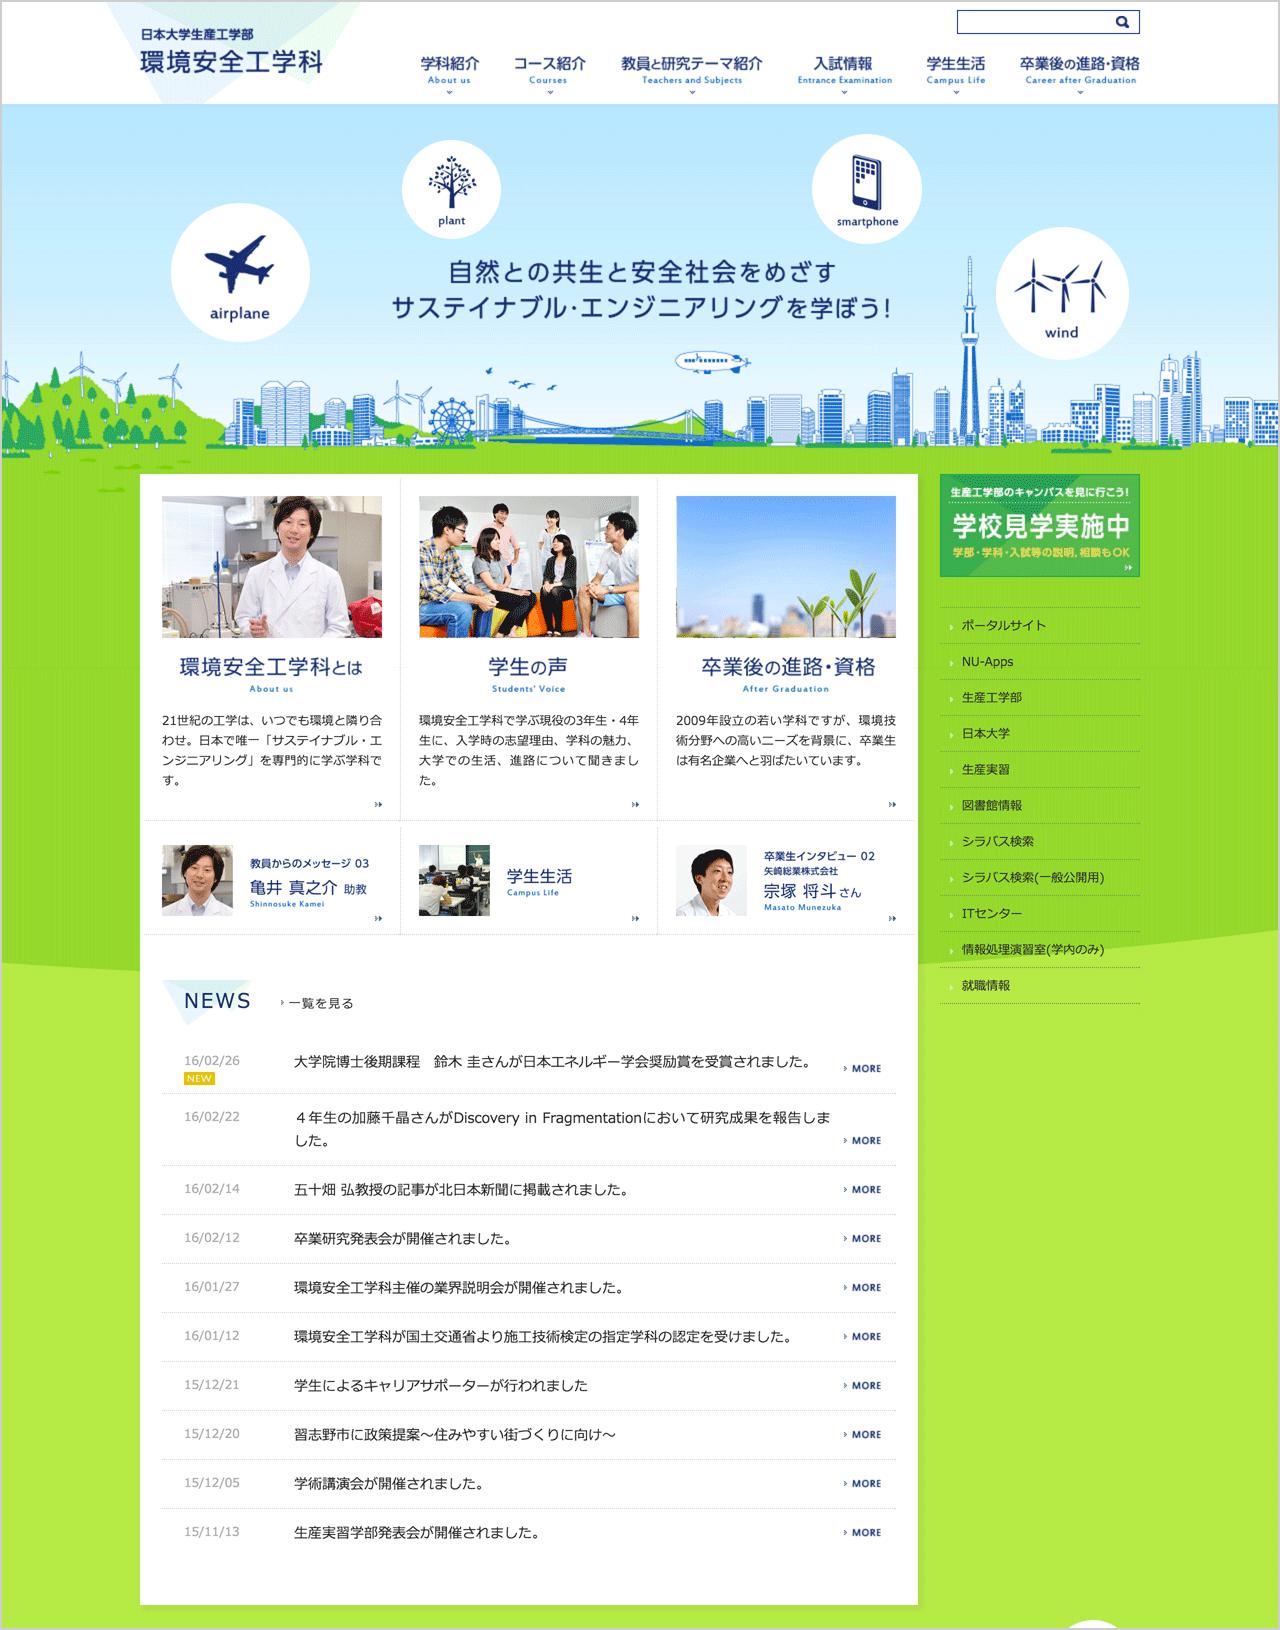 ap_web_nihon-daigaku-seisan-kankyou_2014_pc.png